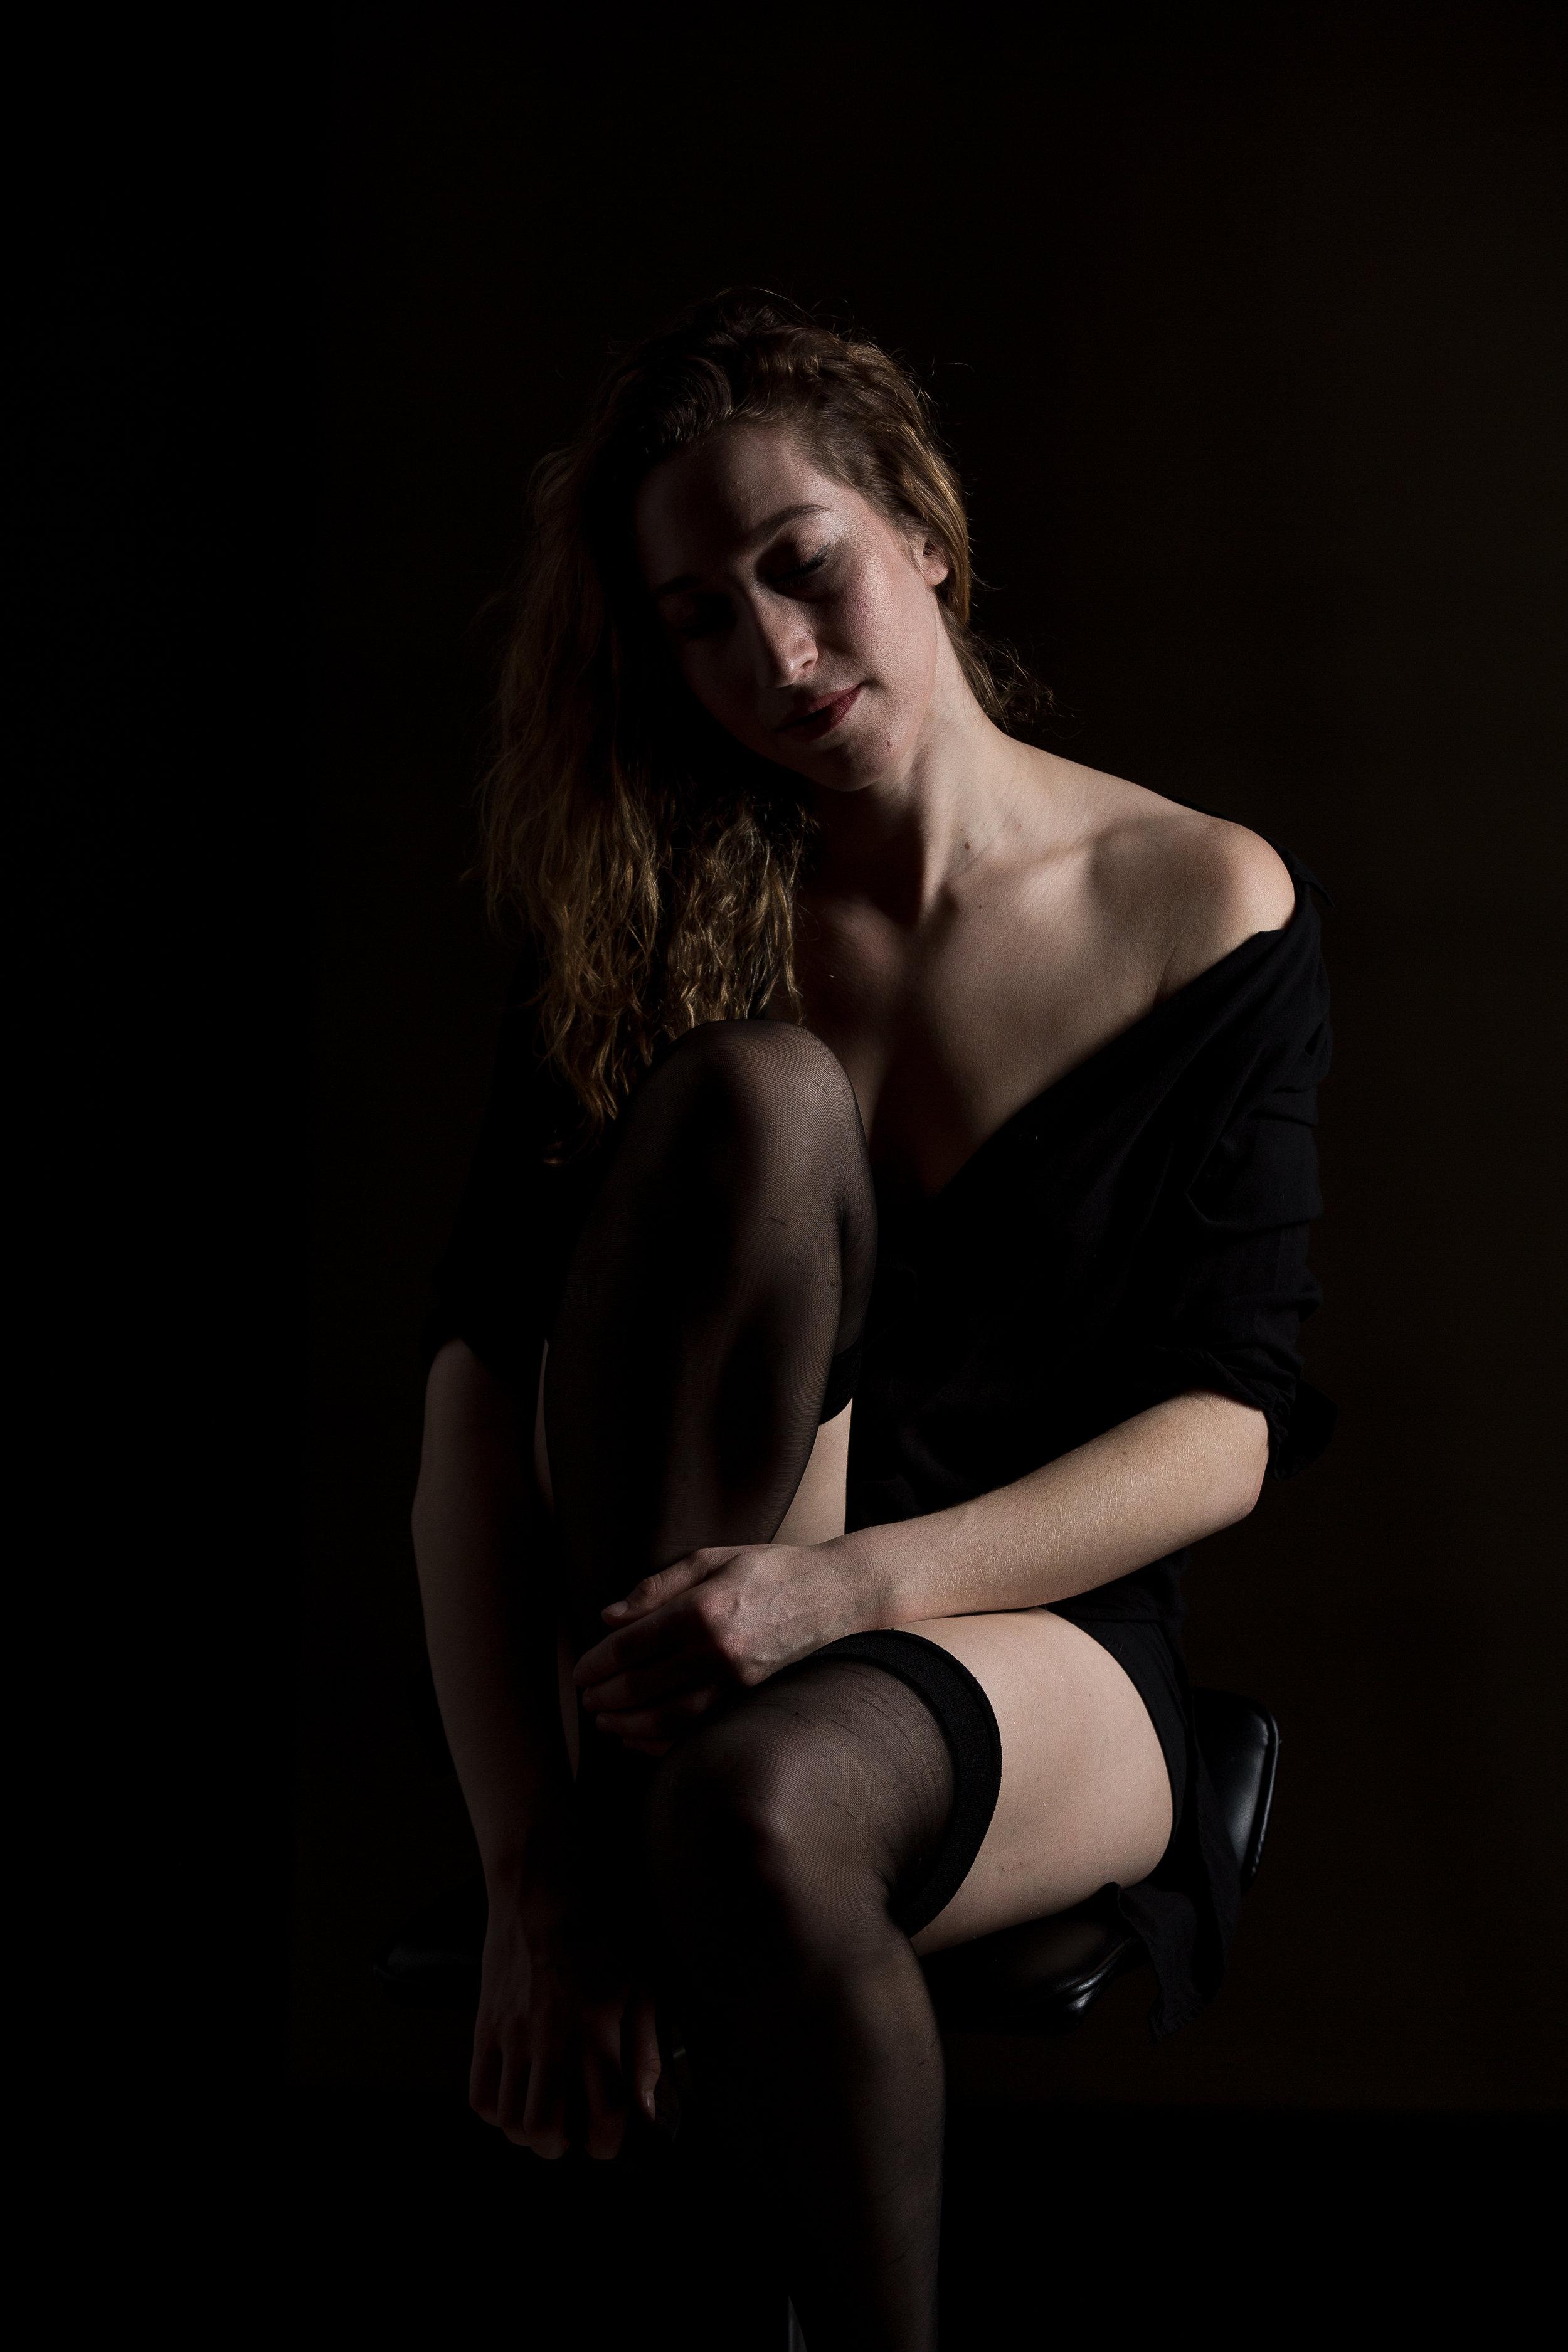 Nicole-1117.jpg